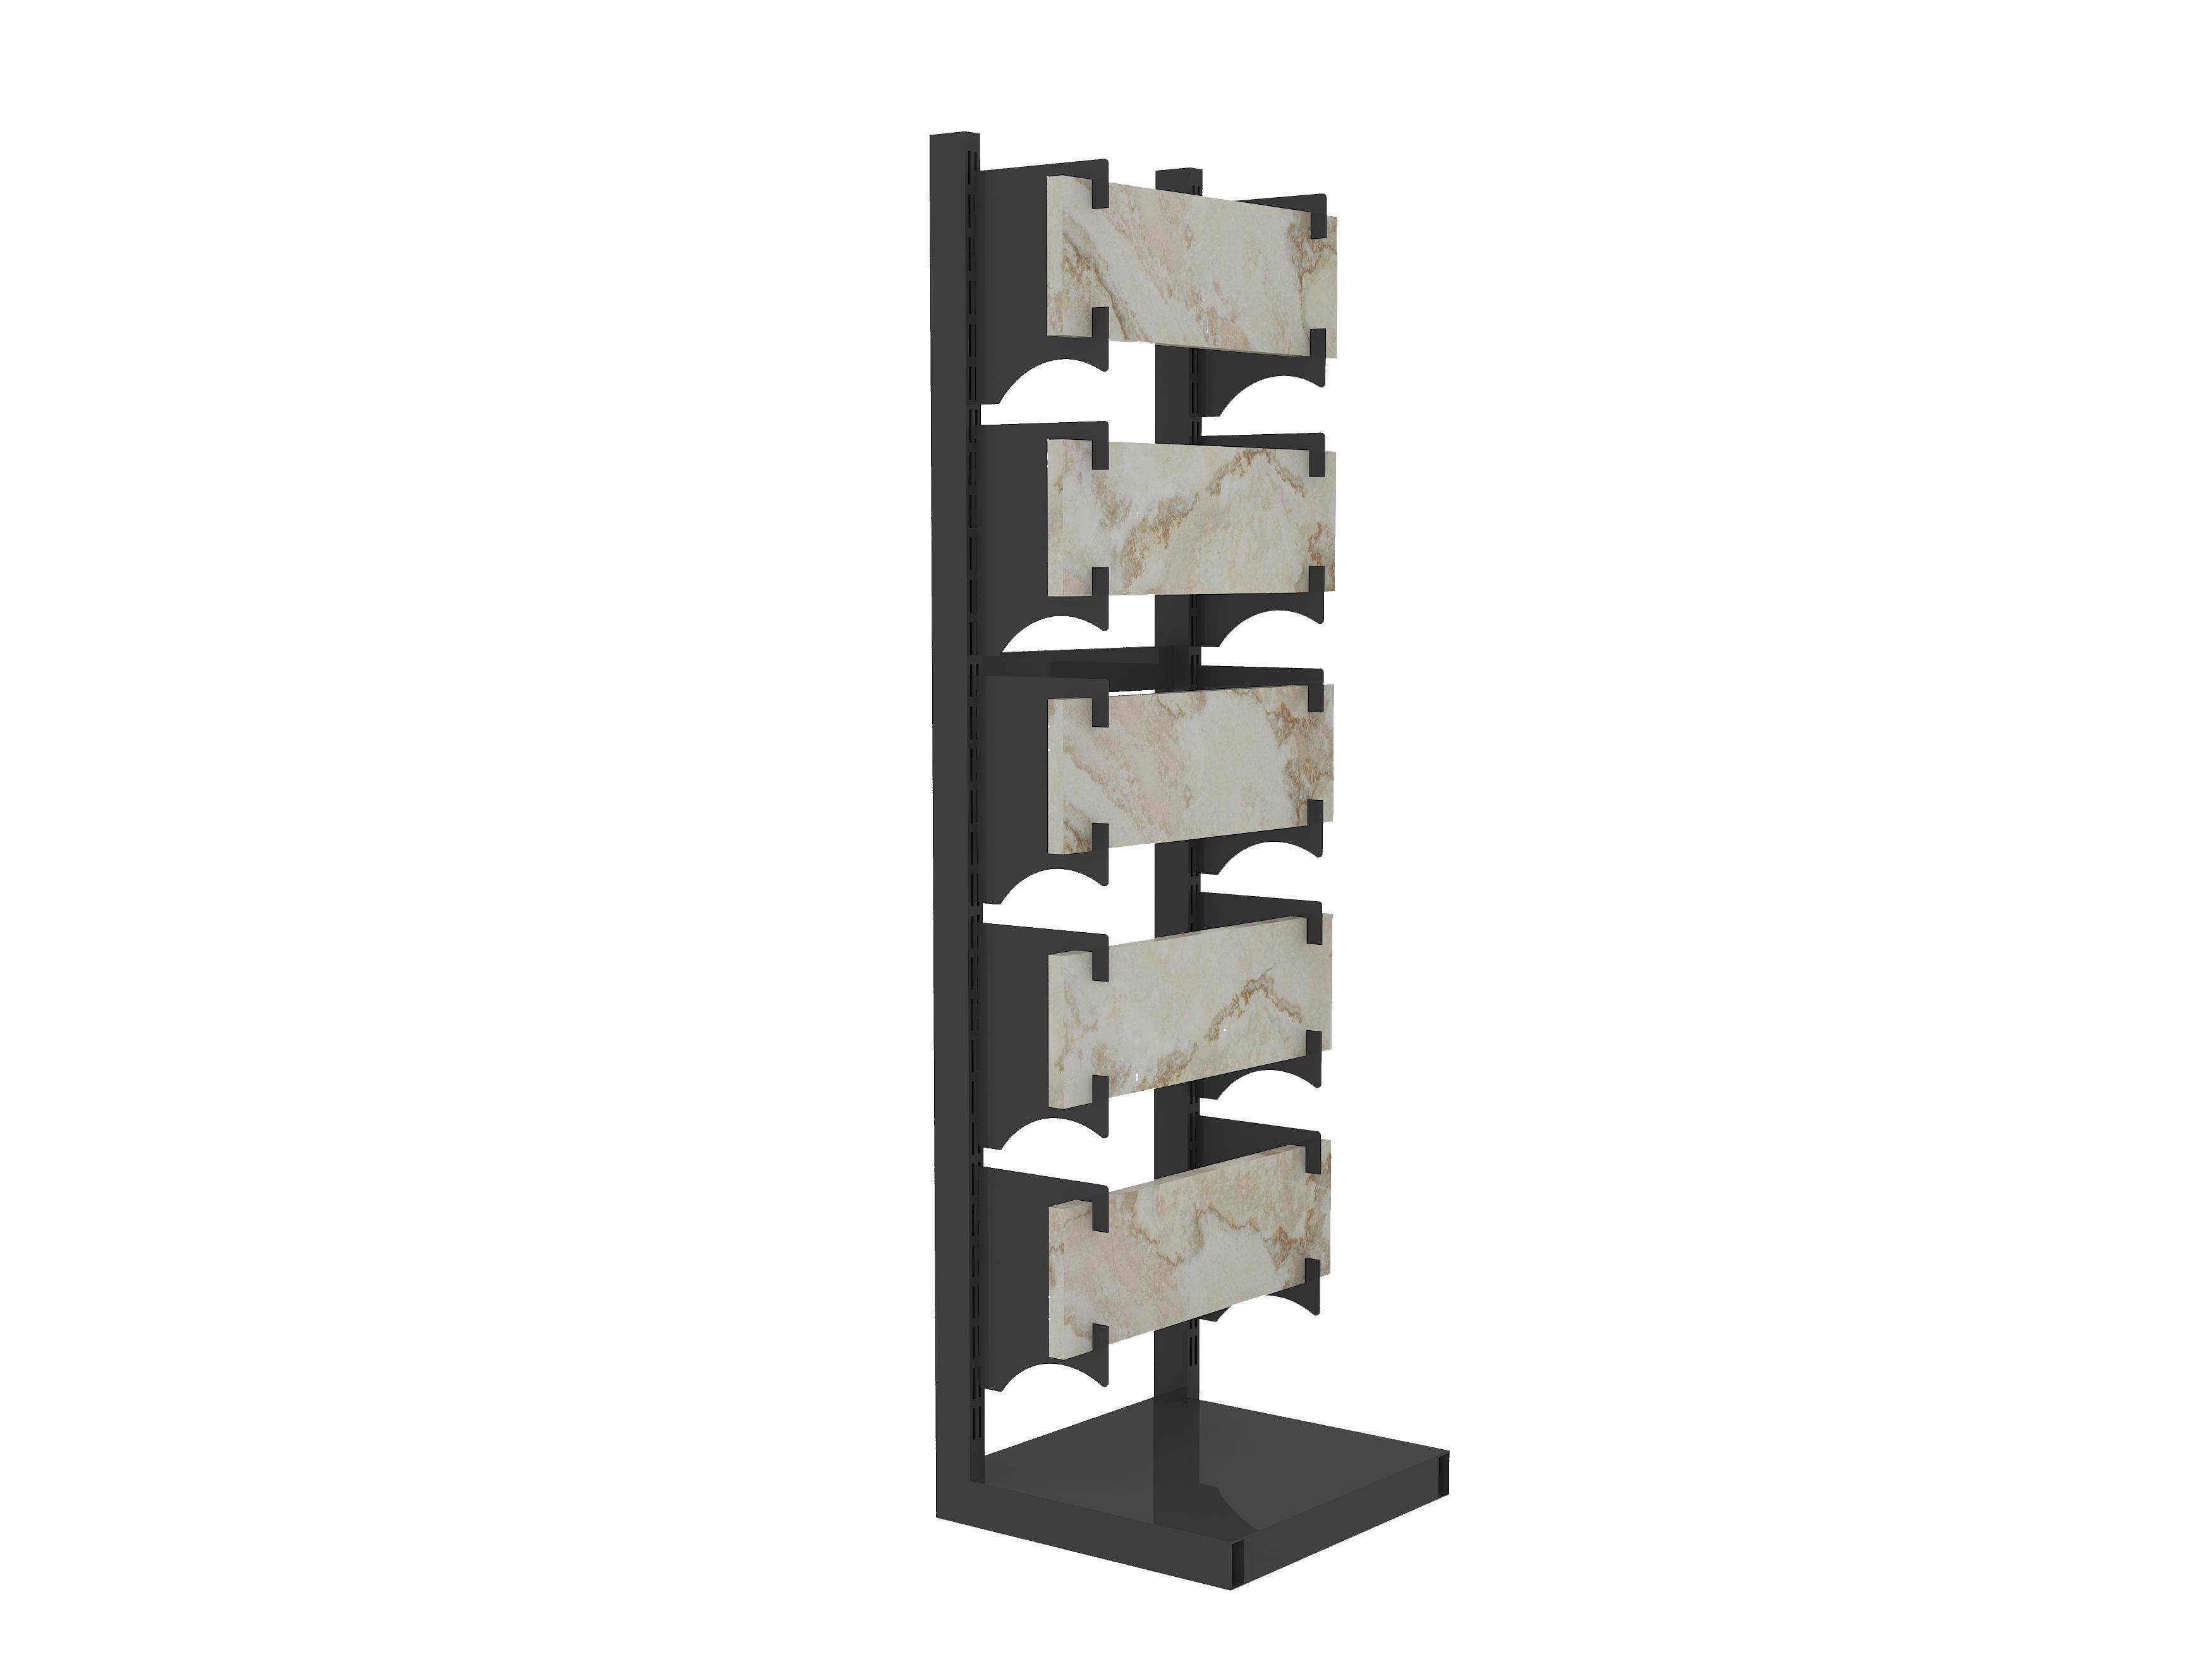 tile-stone-flooring-laminated-display-ST-99-2